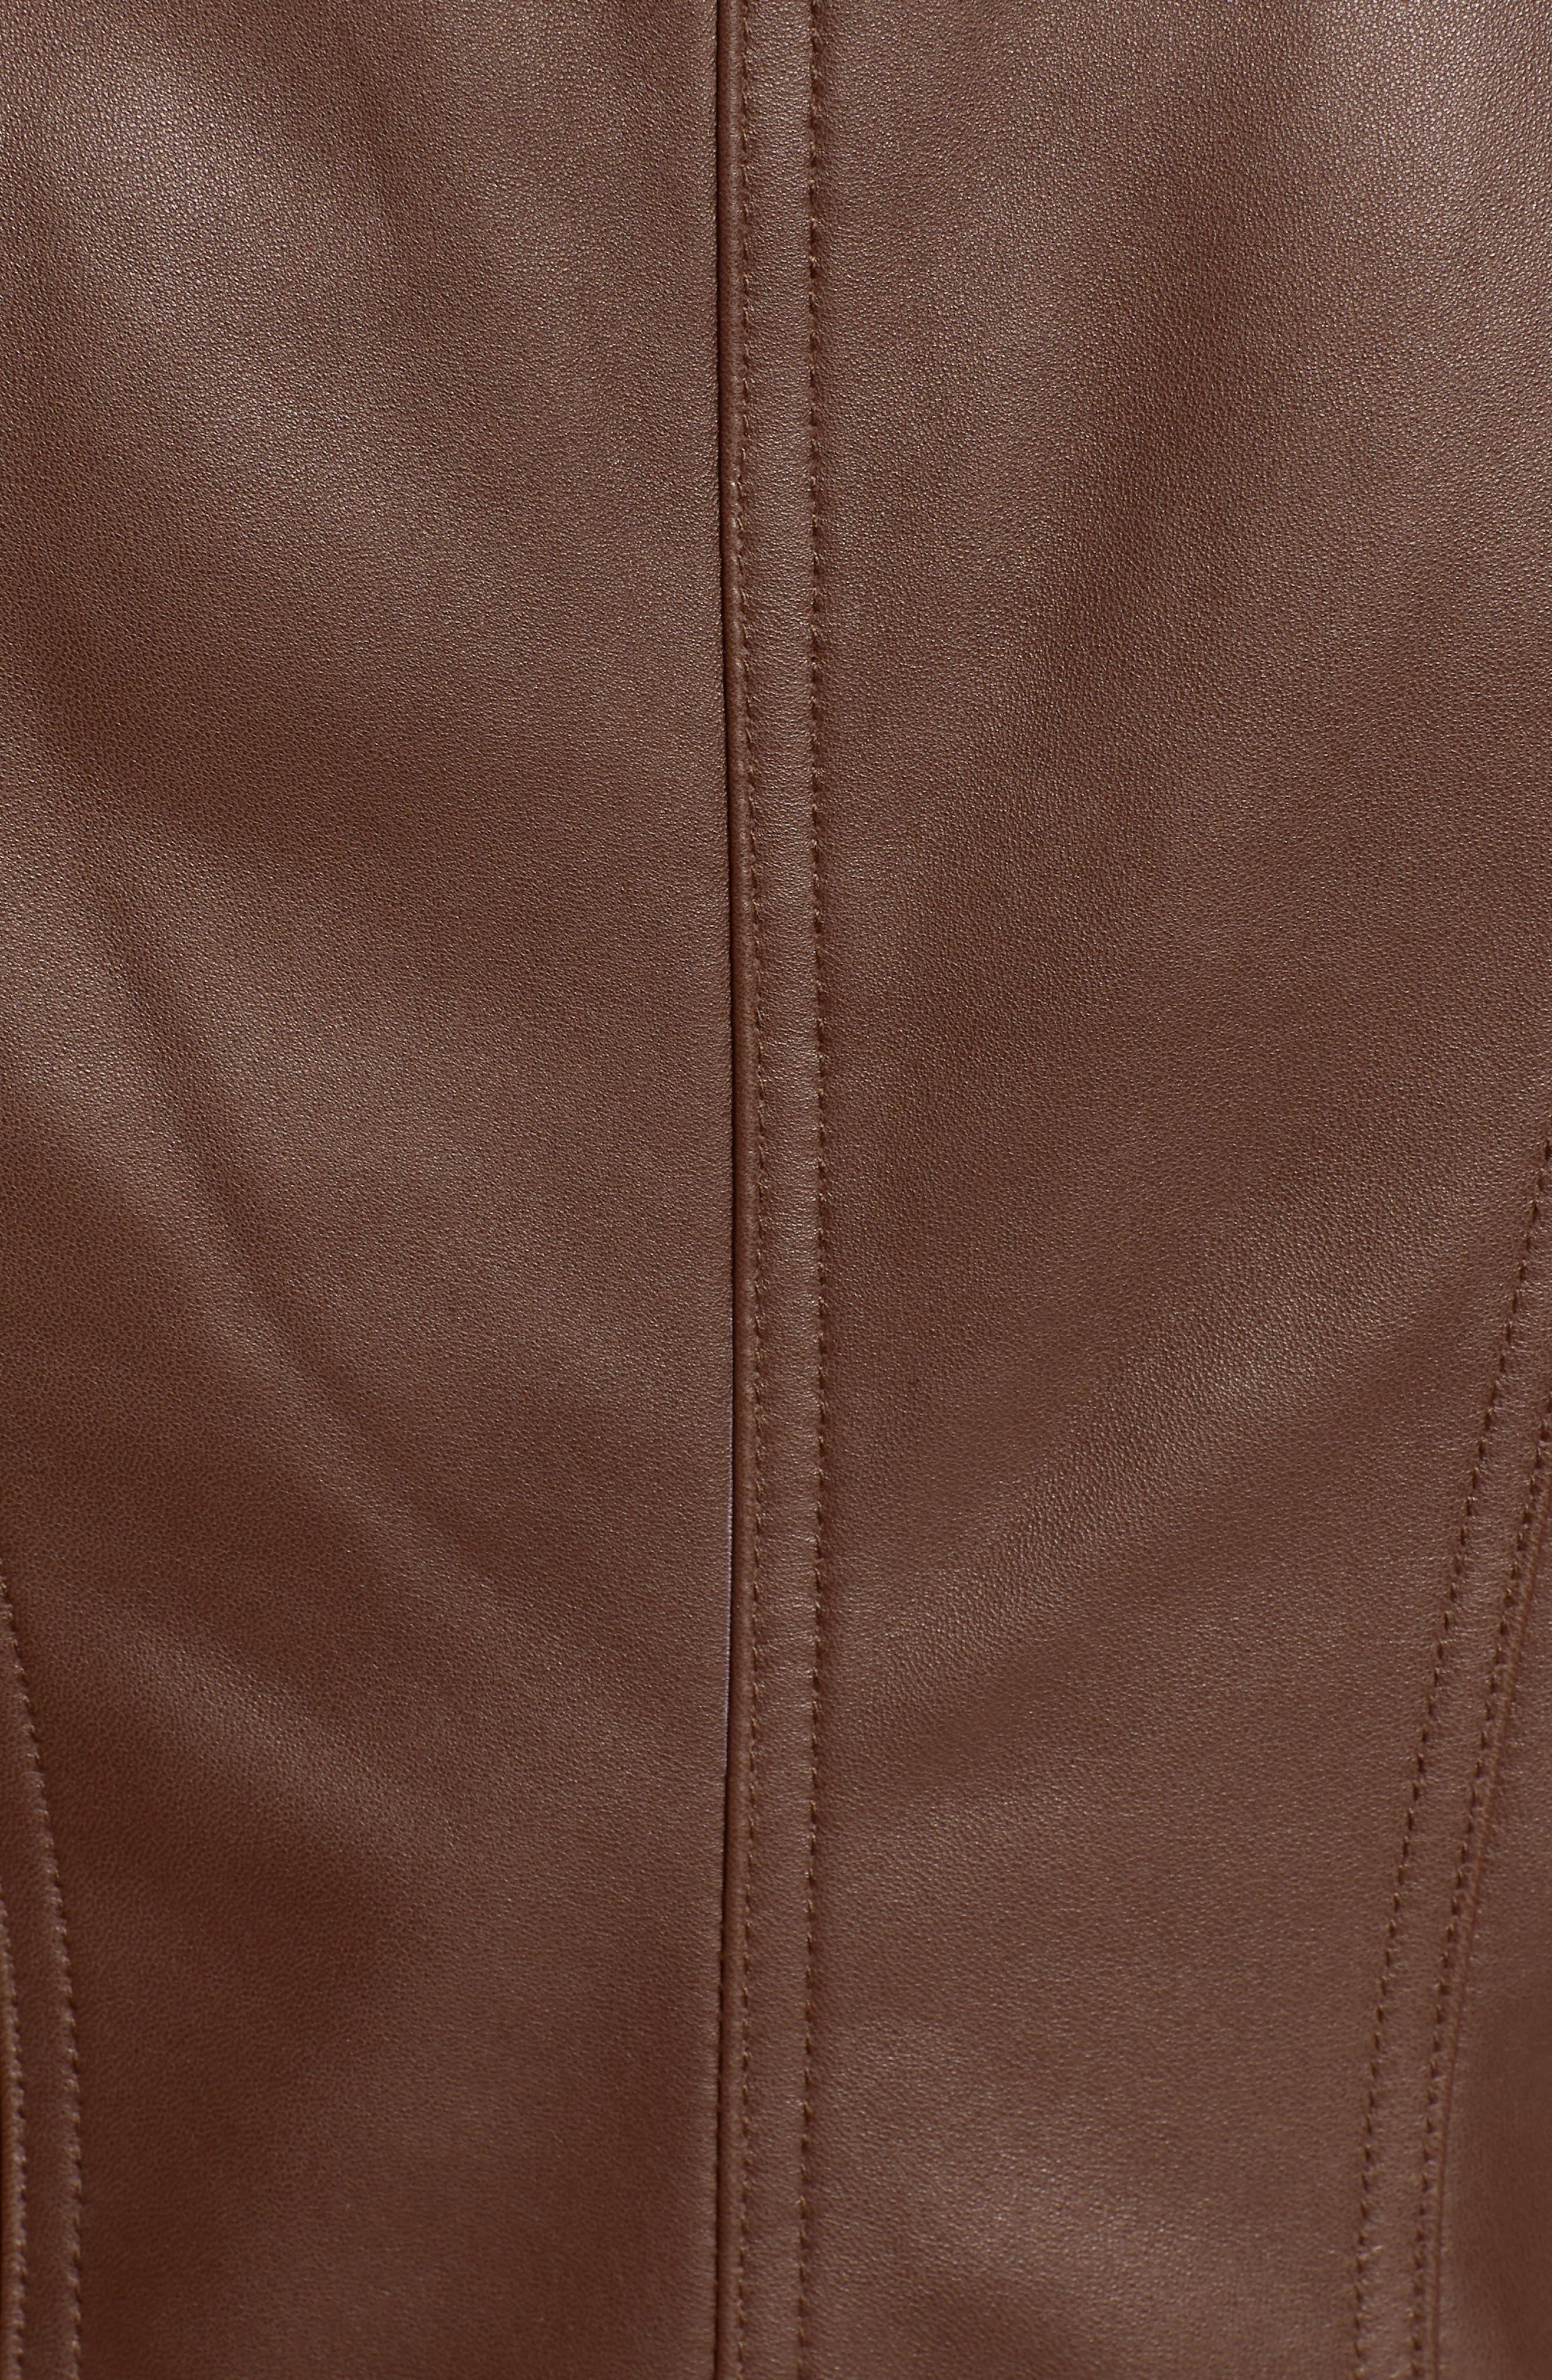 BADGLEY MISCHKA COLLECTION, Badgley Mischka Gia Leather Biker Jacket, Alternate thumbnail 7, color, 201